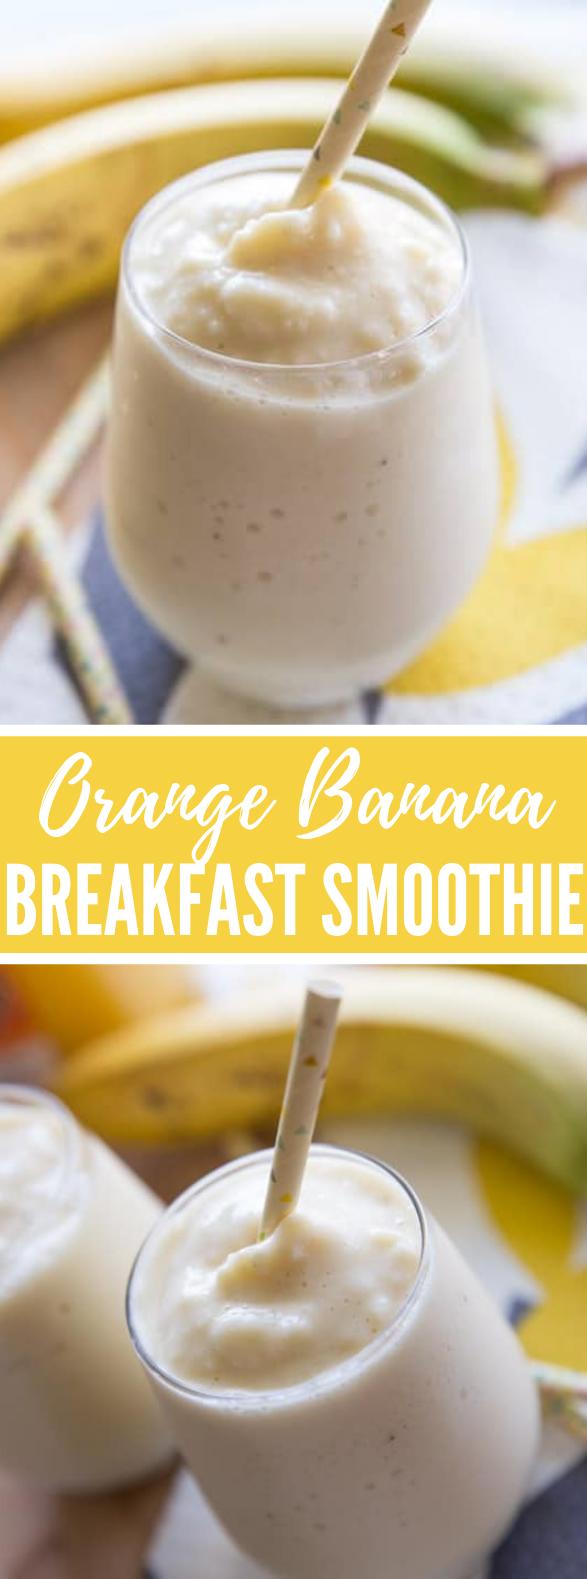 ORANGE BANANA BREAKFAST SMOOTHIE #drink #healthy